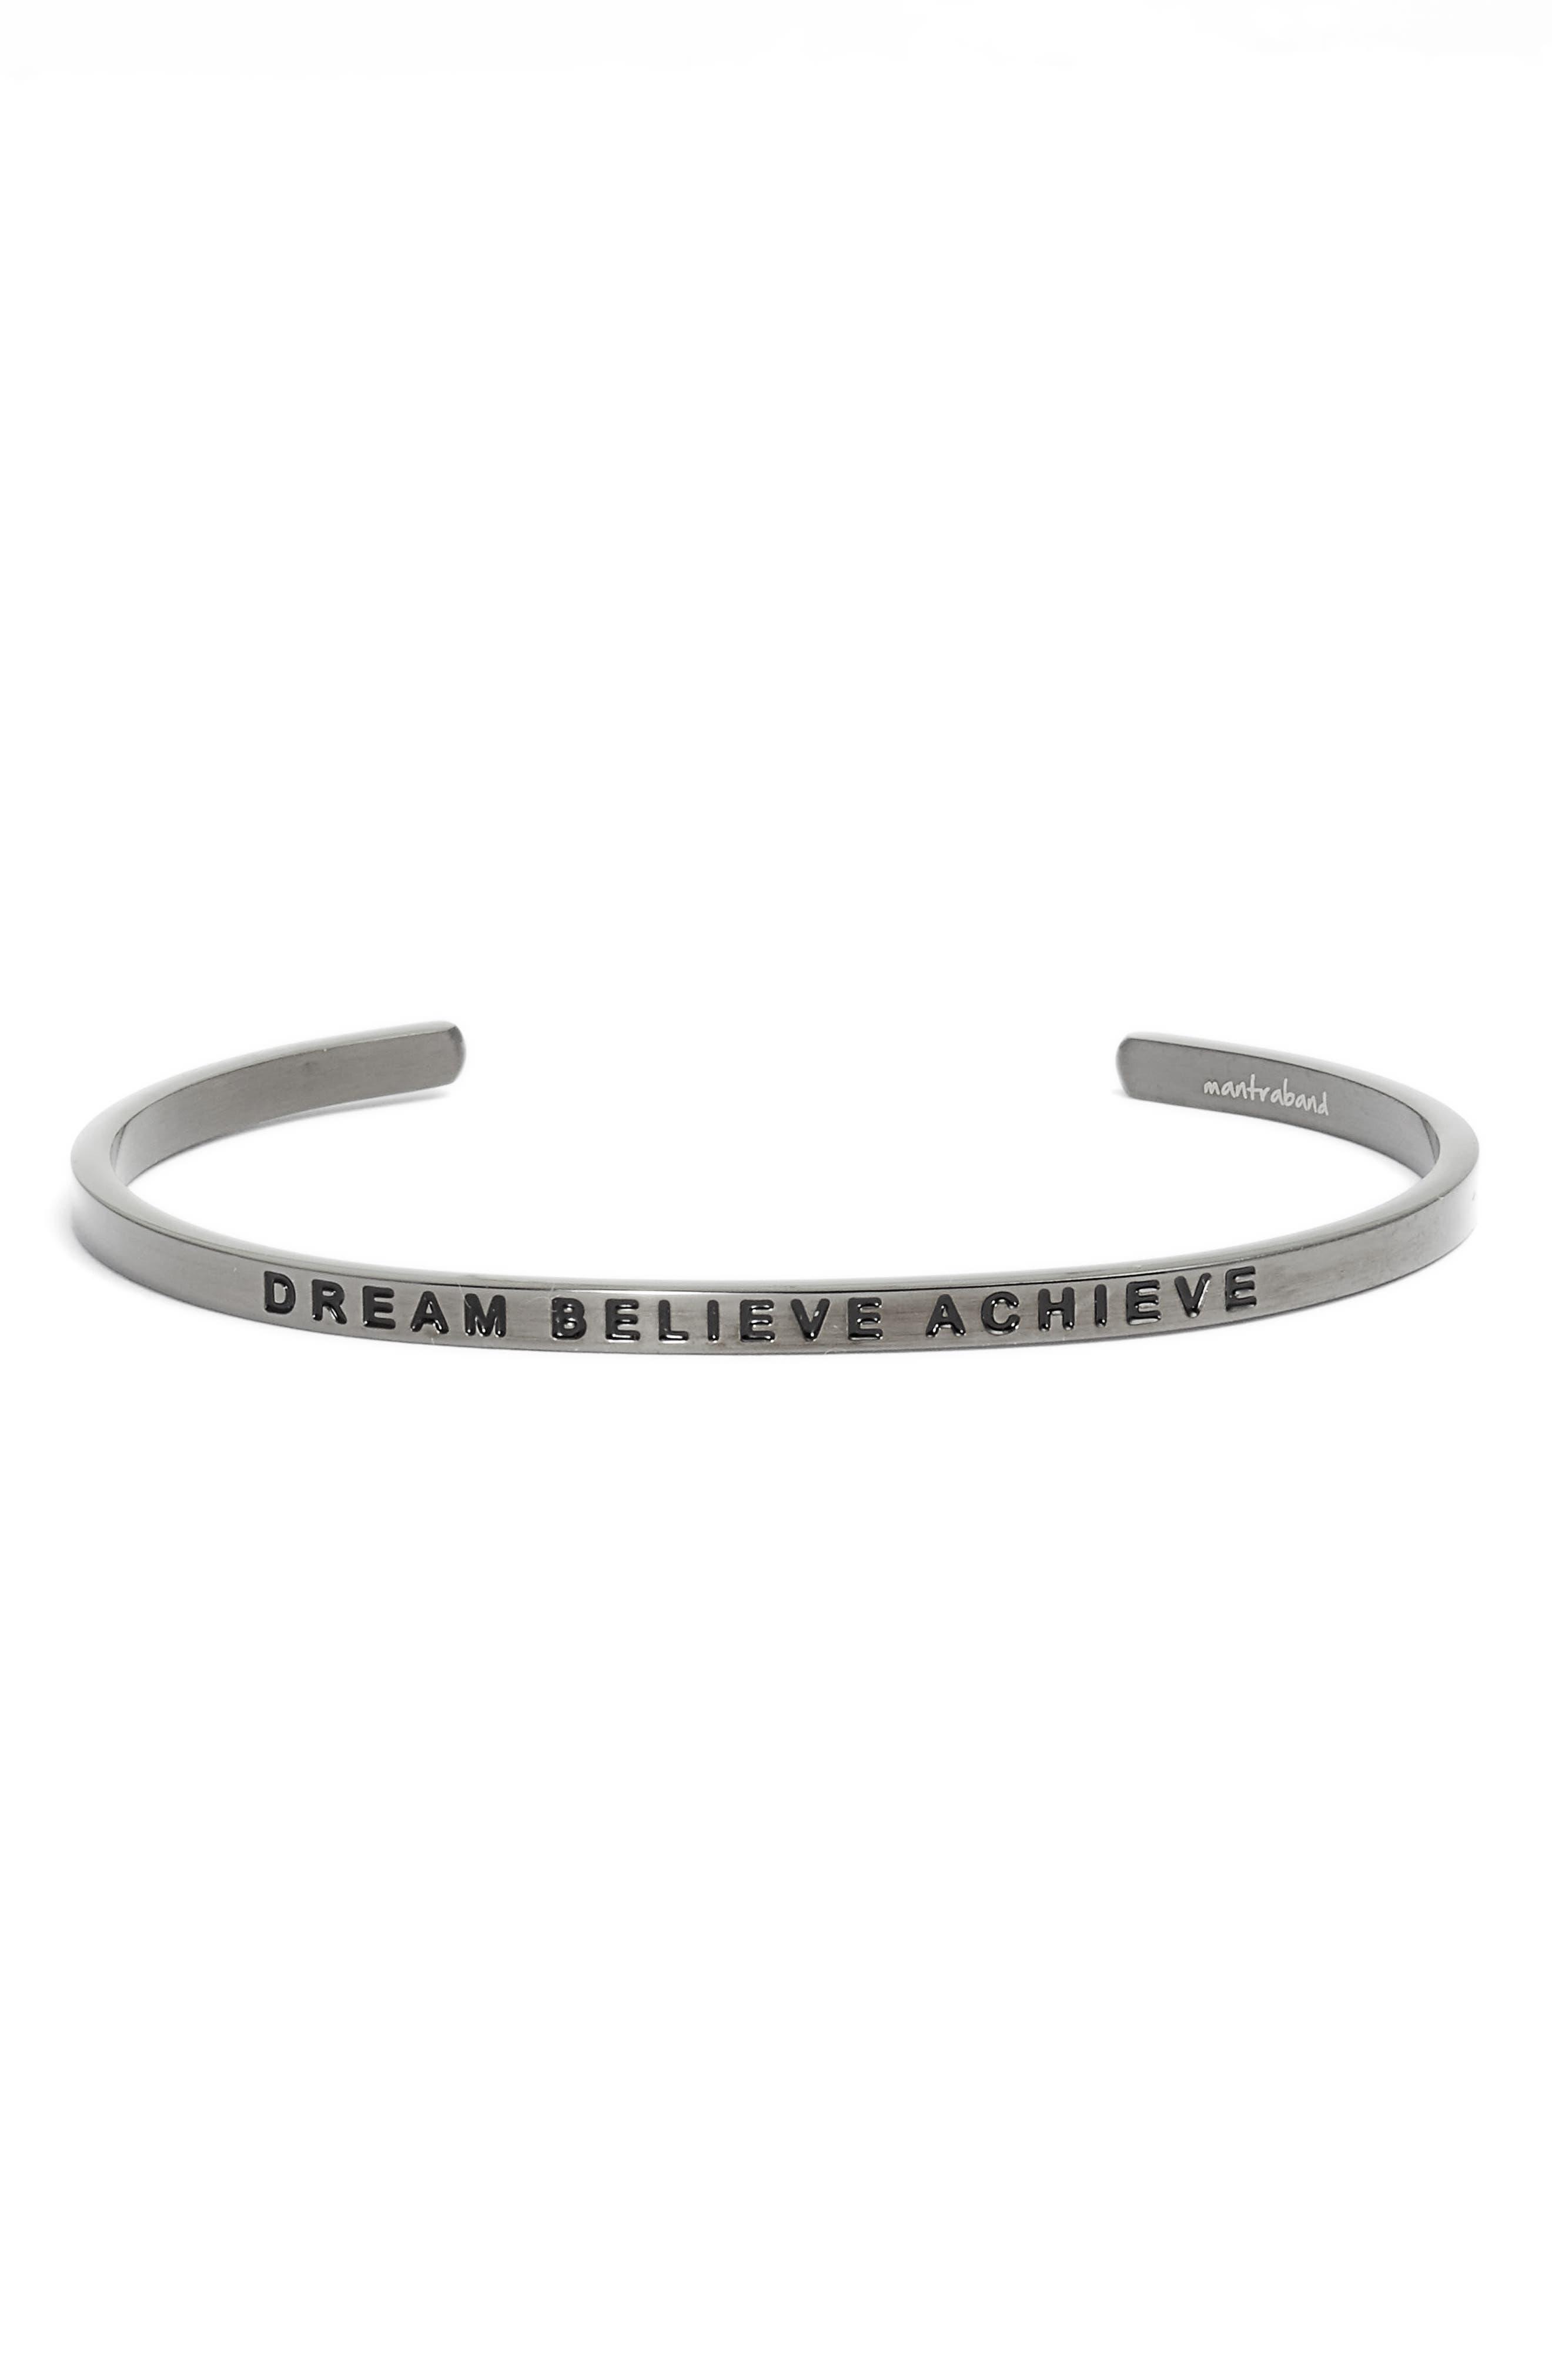 Dream Believe Achieve Cuff Bracelet,                         Main,                         color, Moon Gray